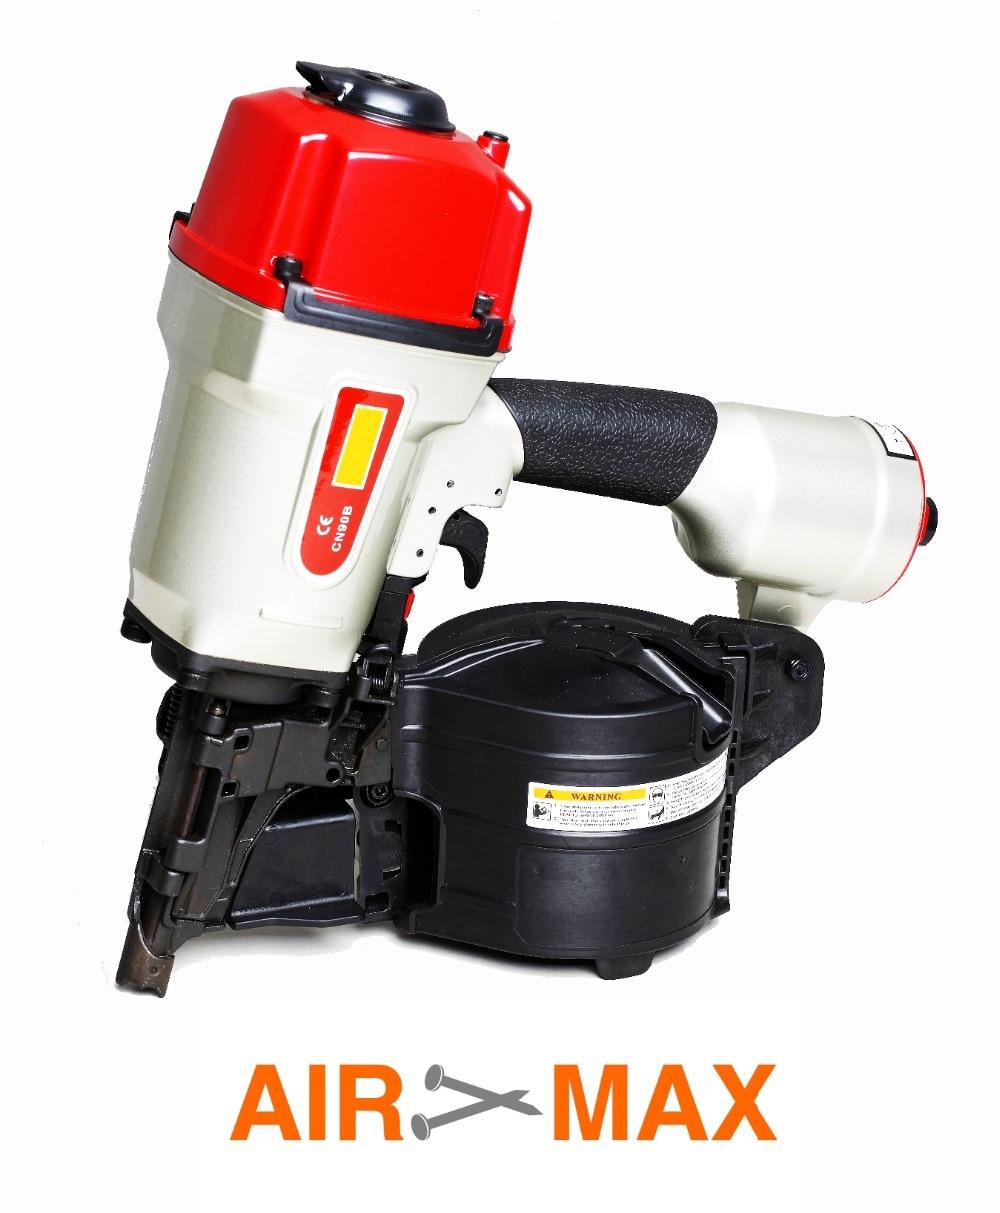 Image 2 - AIR INDUSTRIAL COIL NAILER NAIL GUN CN90 CN90Bnail guncoil nail gunair coil nail gun -